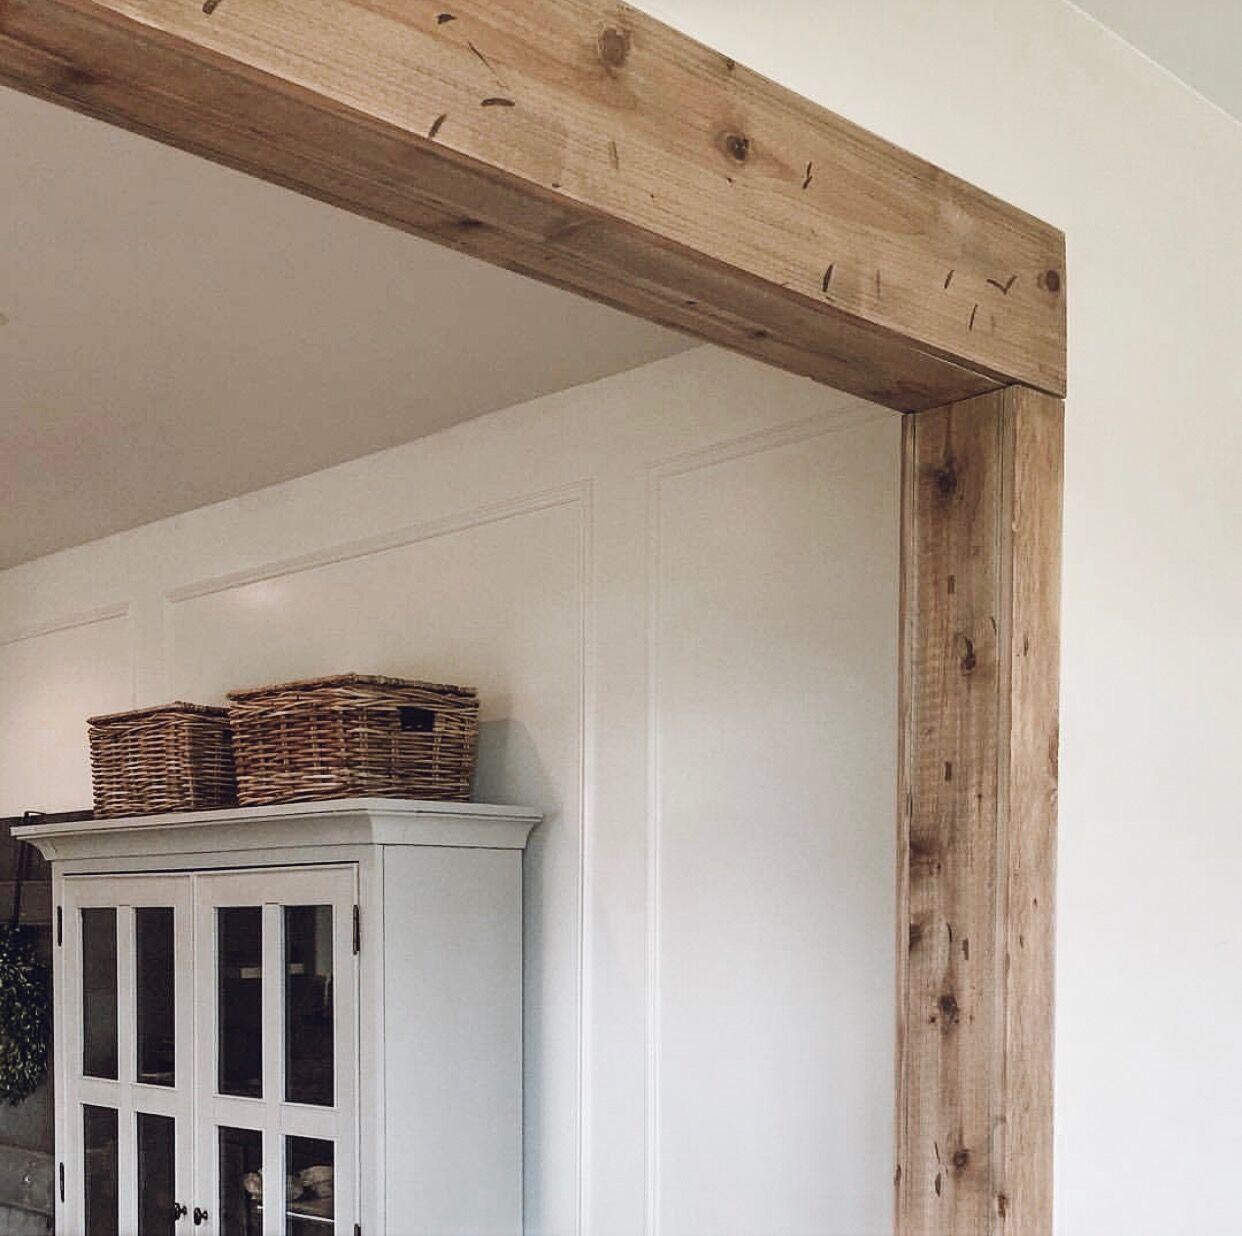 Faux Barnwood Beam Doorway 100 Diy Projects Wood Beam Ceiling Faux Wood Beams Faux Beams